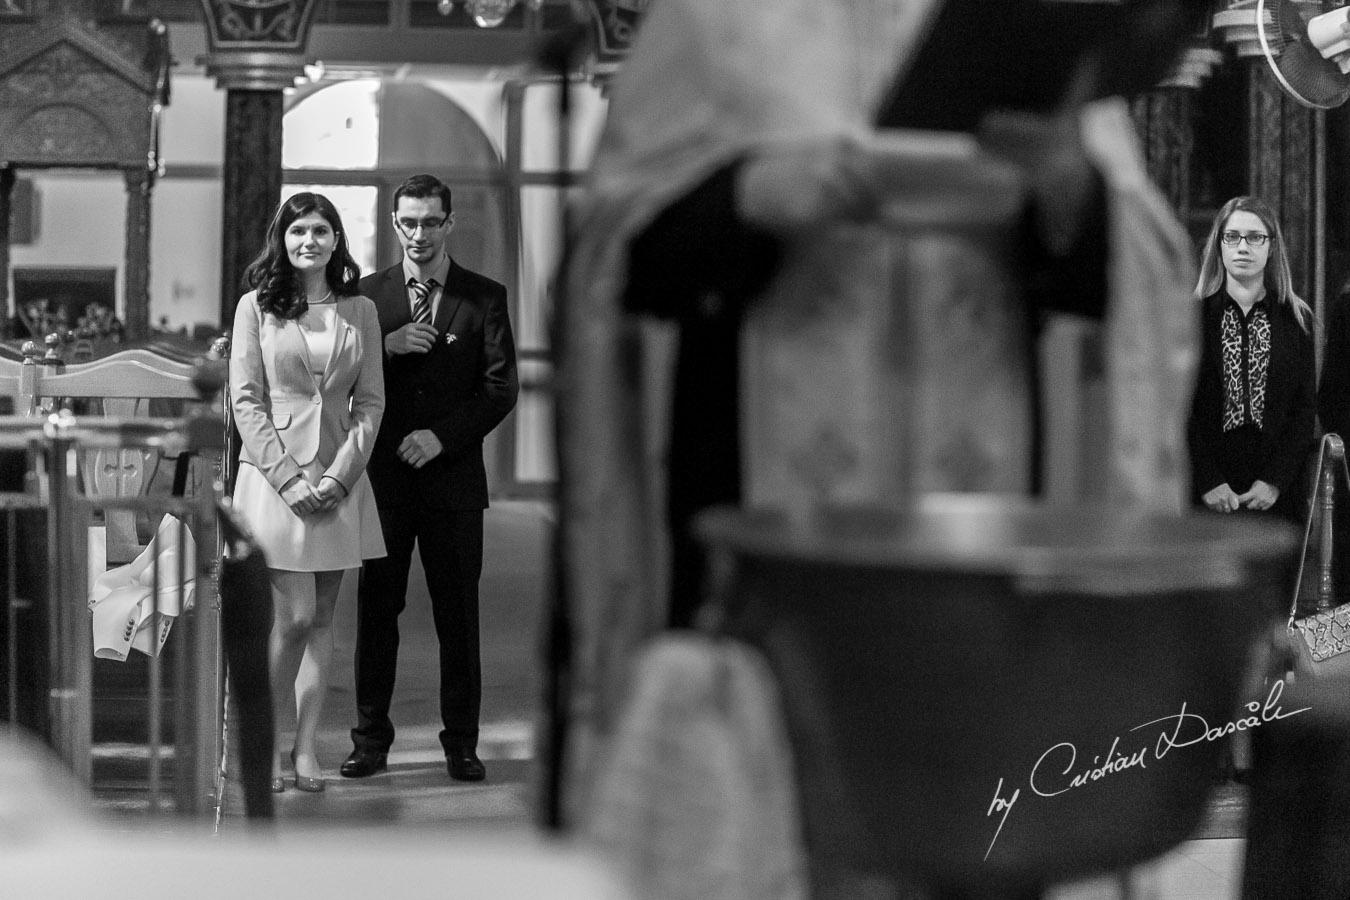 Christening Photography Nicosia. Photographer: Cristian Dascalu